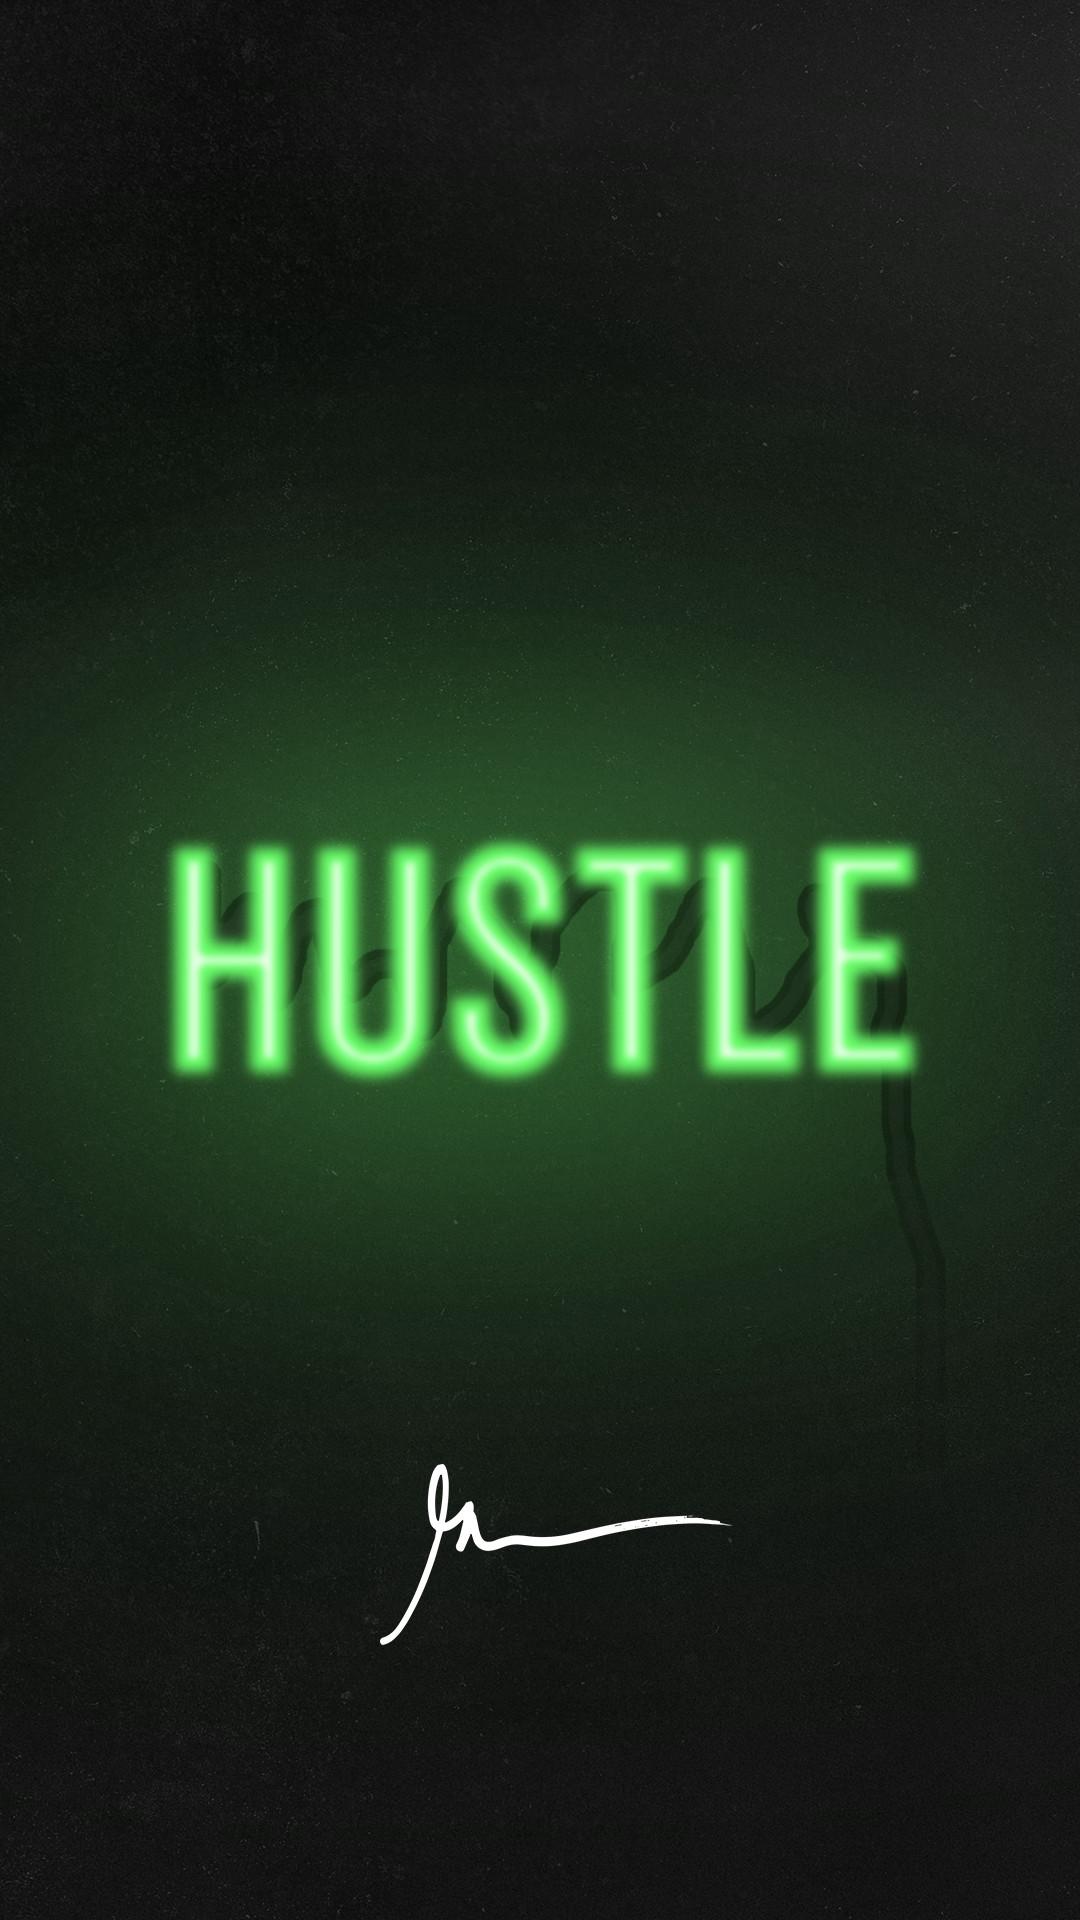 Signature Wallpaper. Hustle